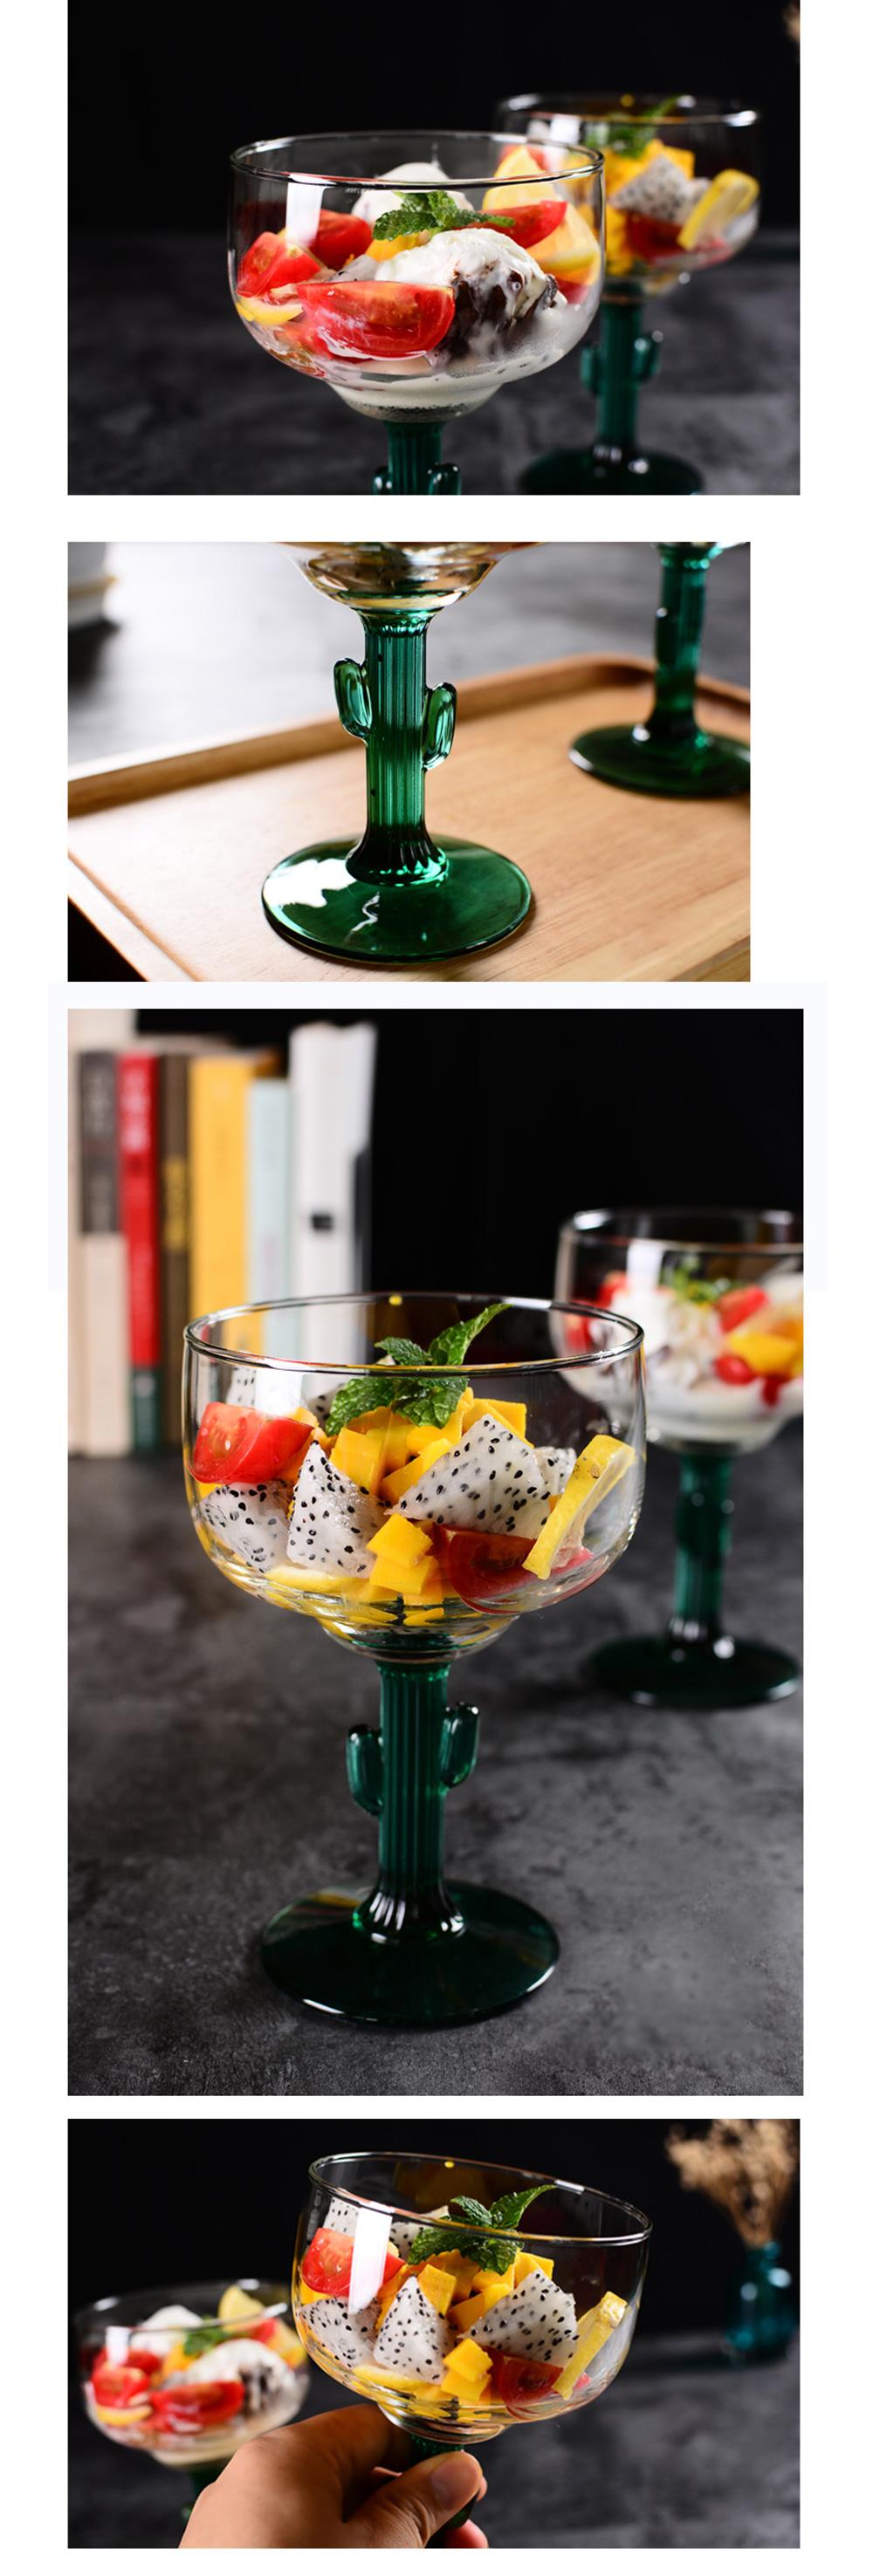 Glass Ice Cream Cup Enjoy Your Ice Cream